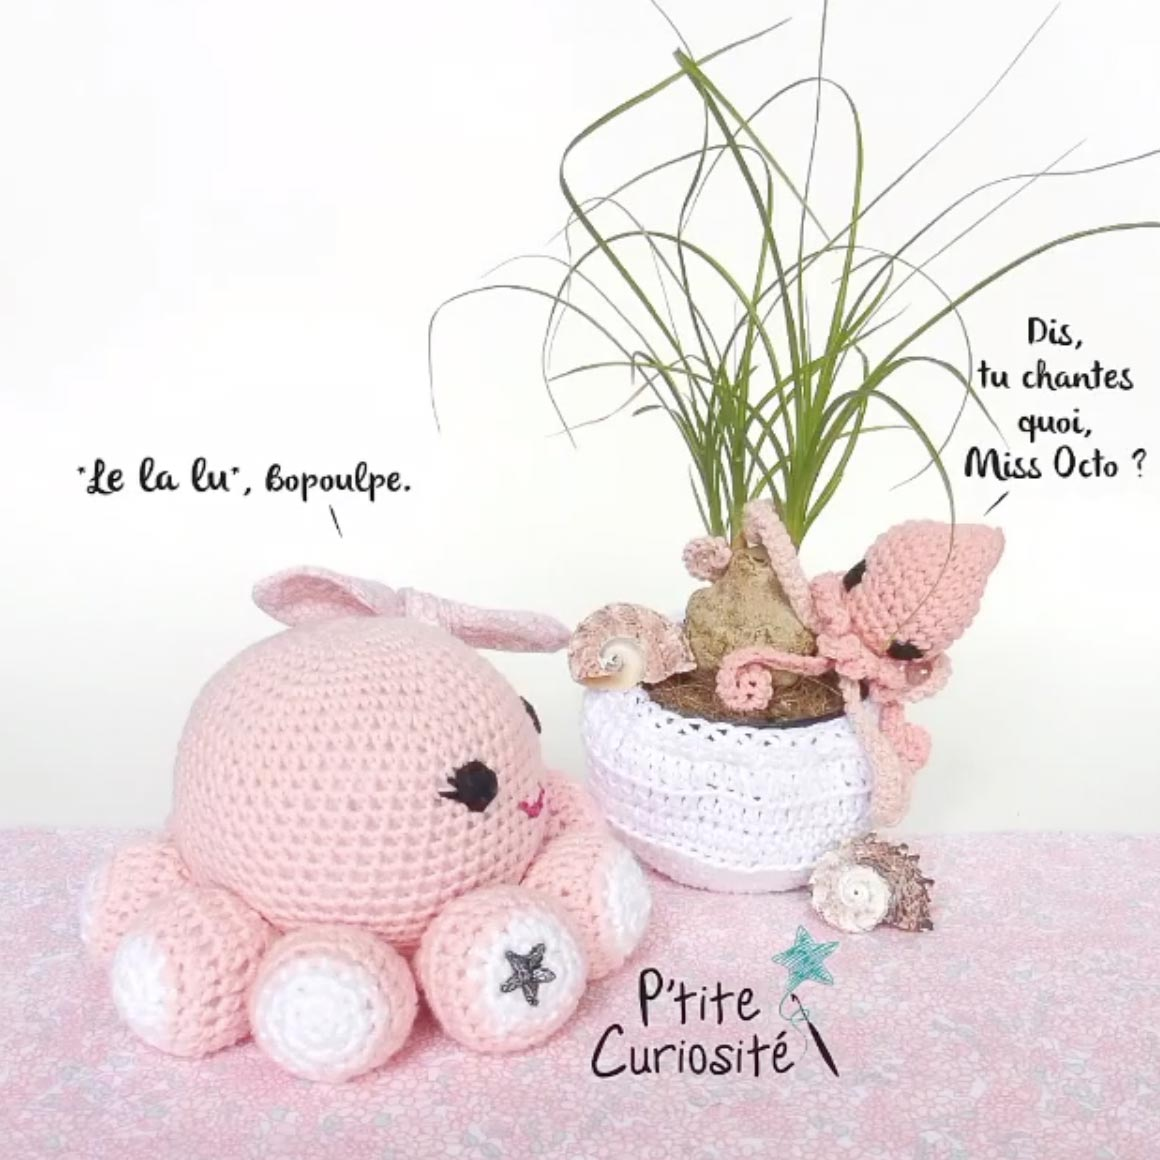 crochet mini poulpe pieuvre rose #diymelimelo